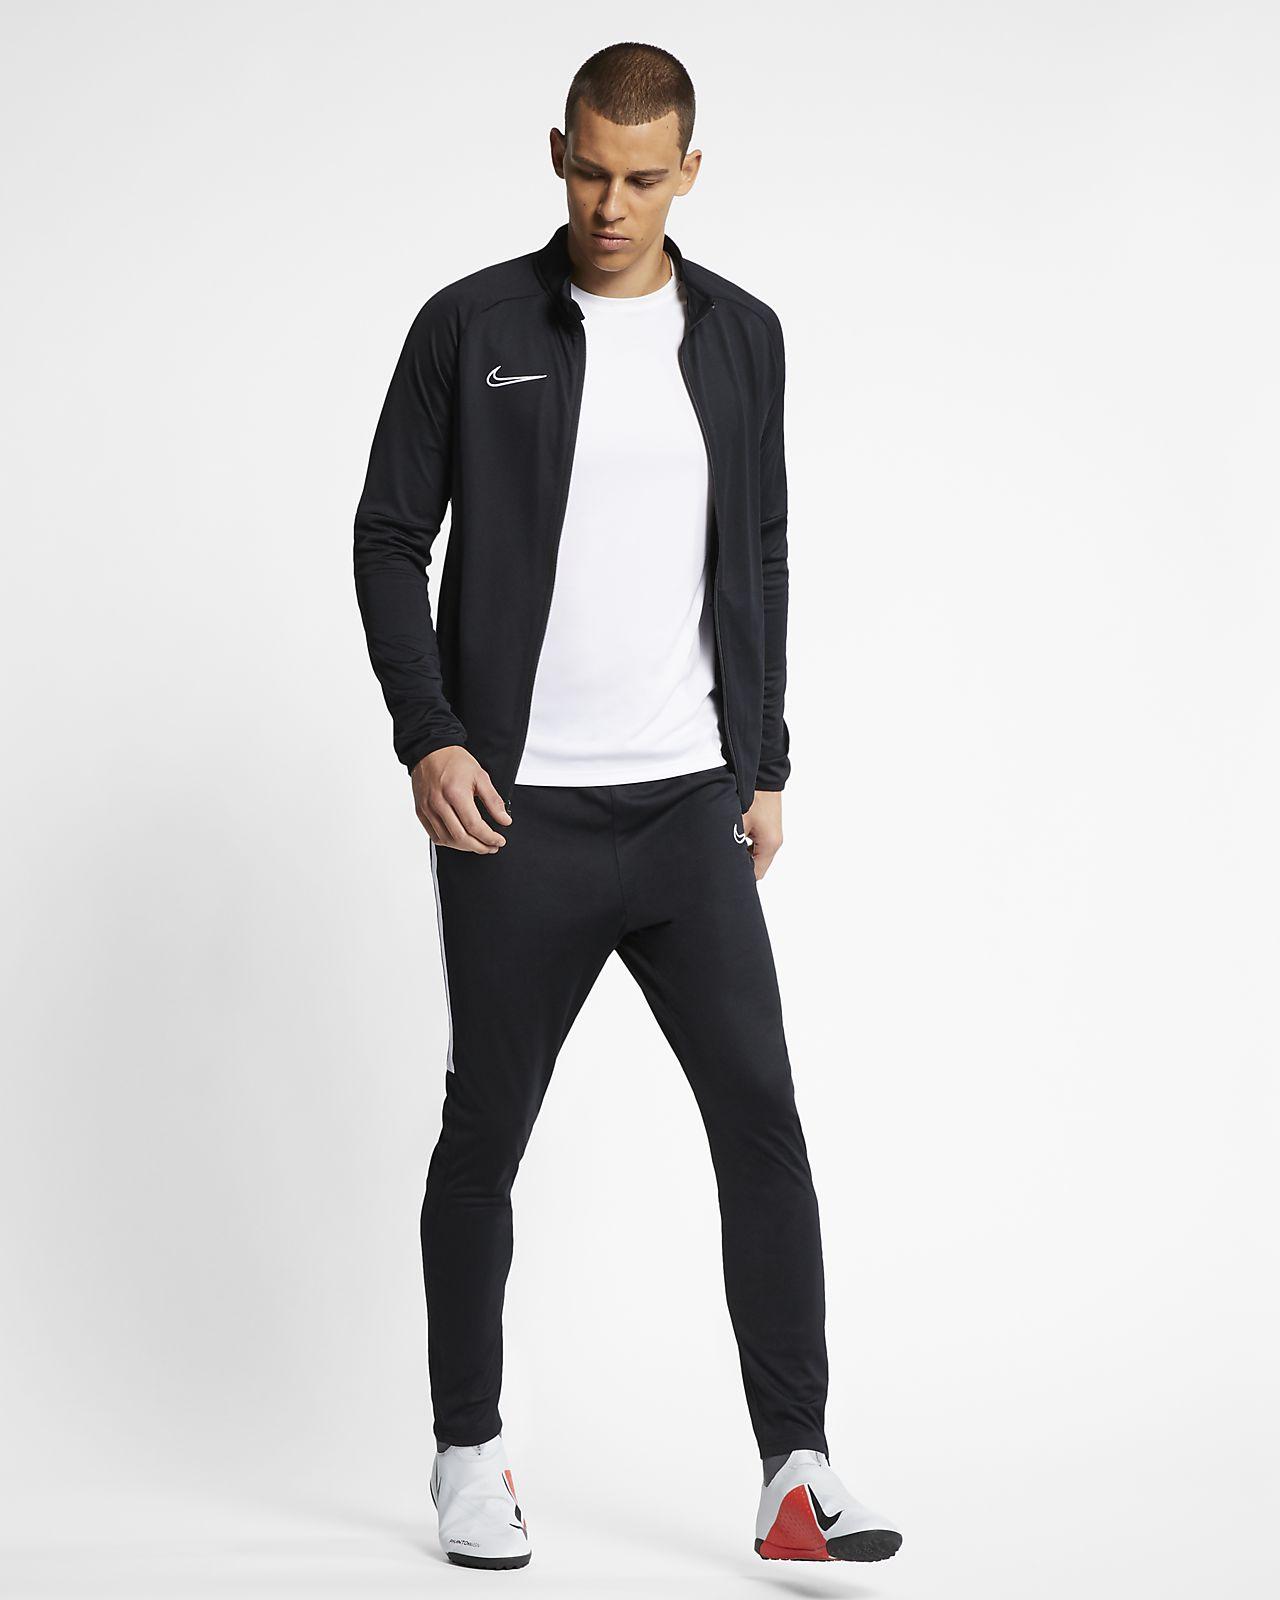 Nike Dri-FIT Academy Herren-Fußball-Trainingsanzug